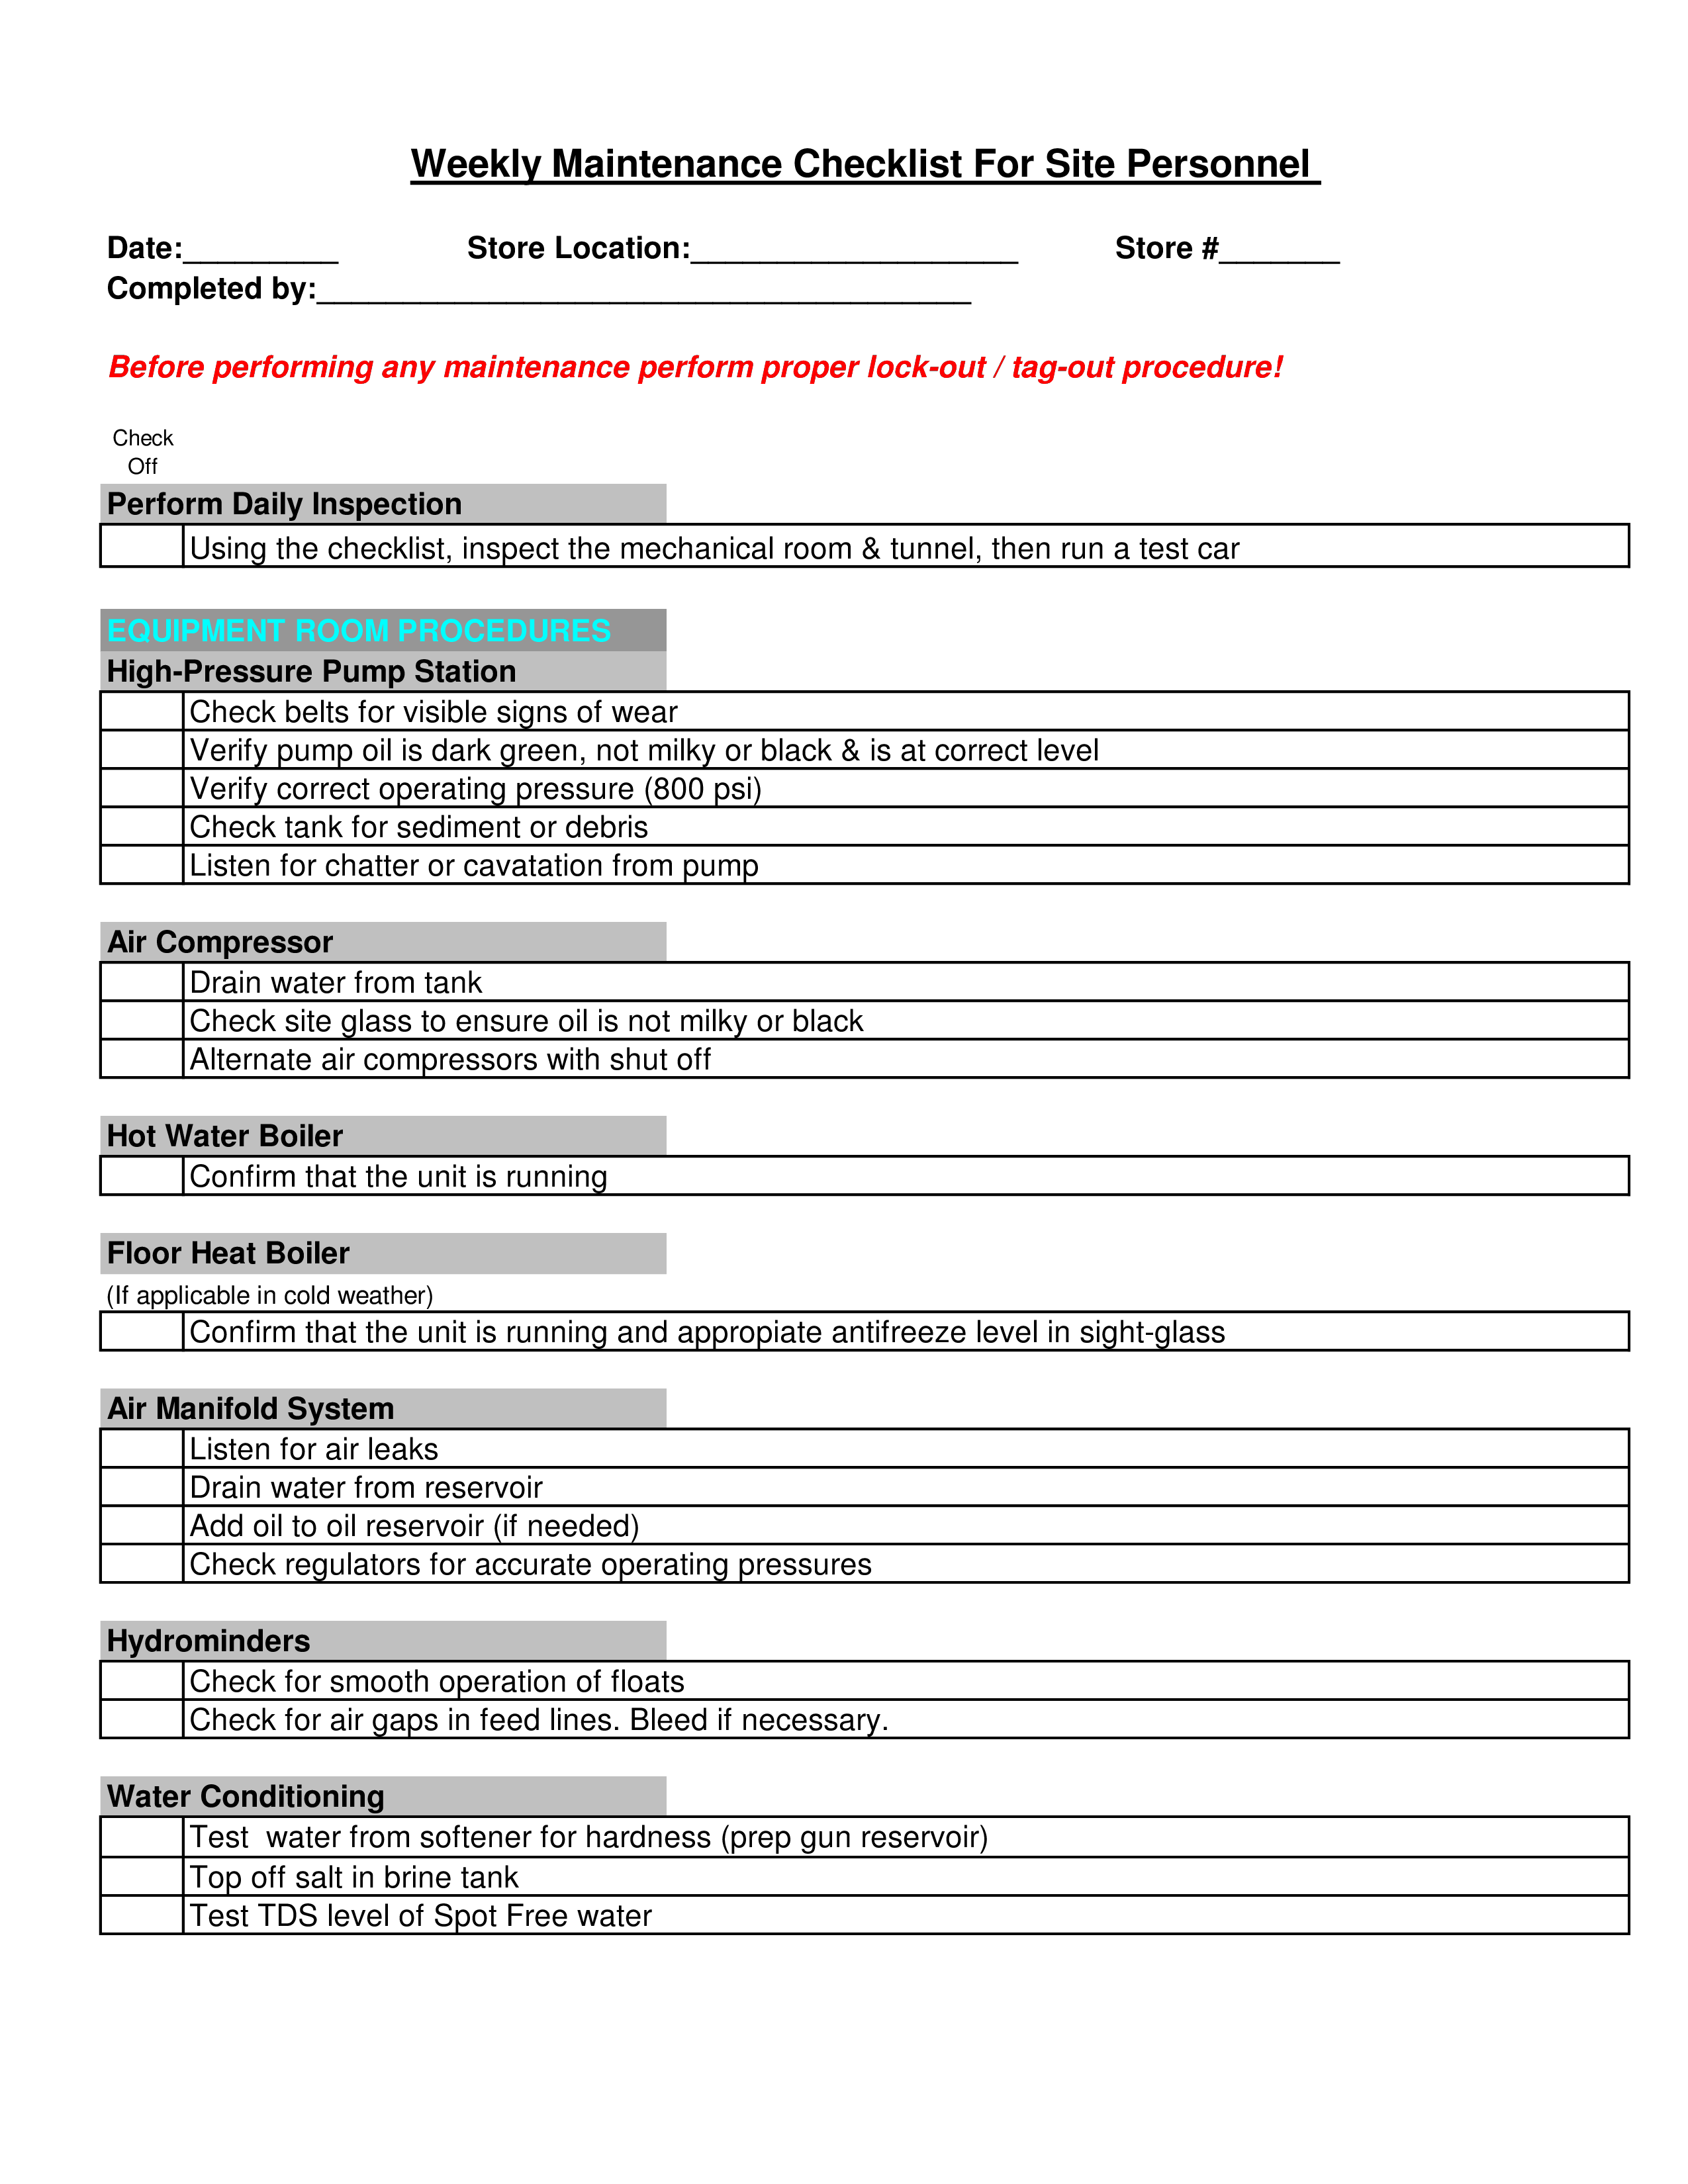 free weekly maintenance checklist templates at